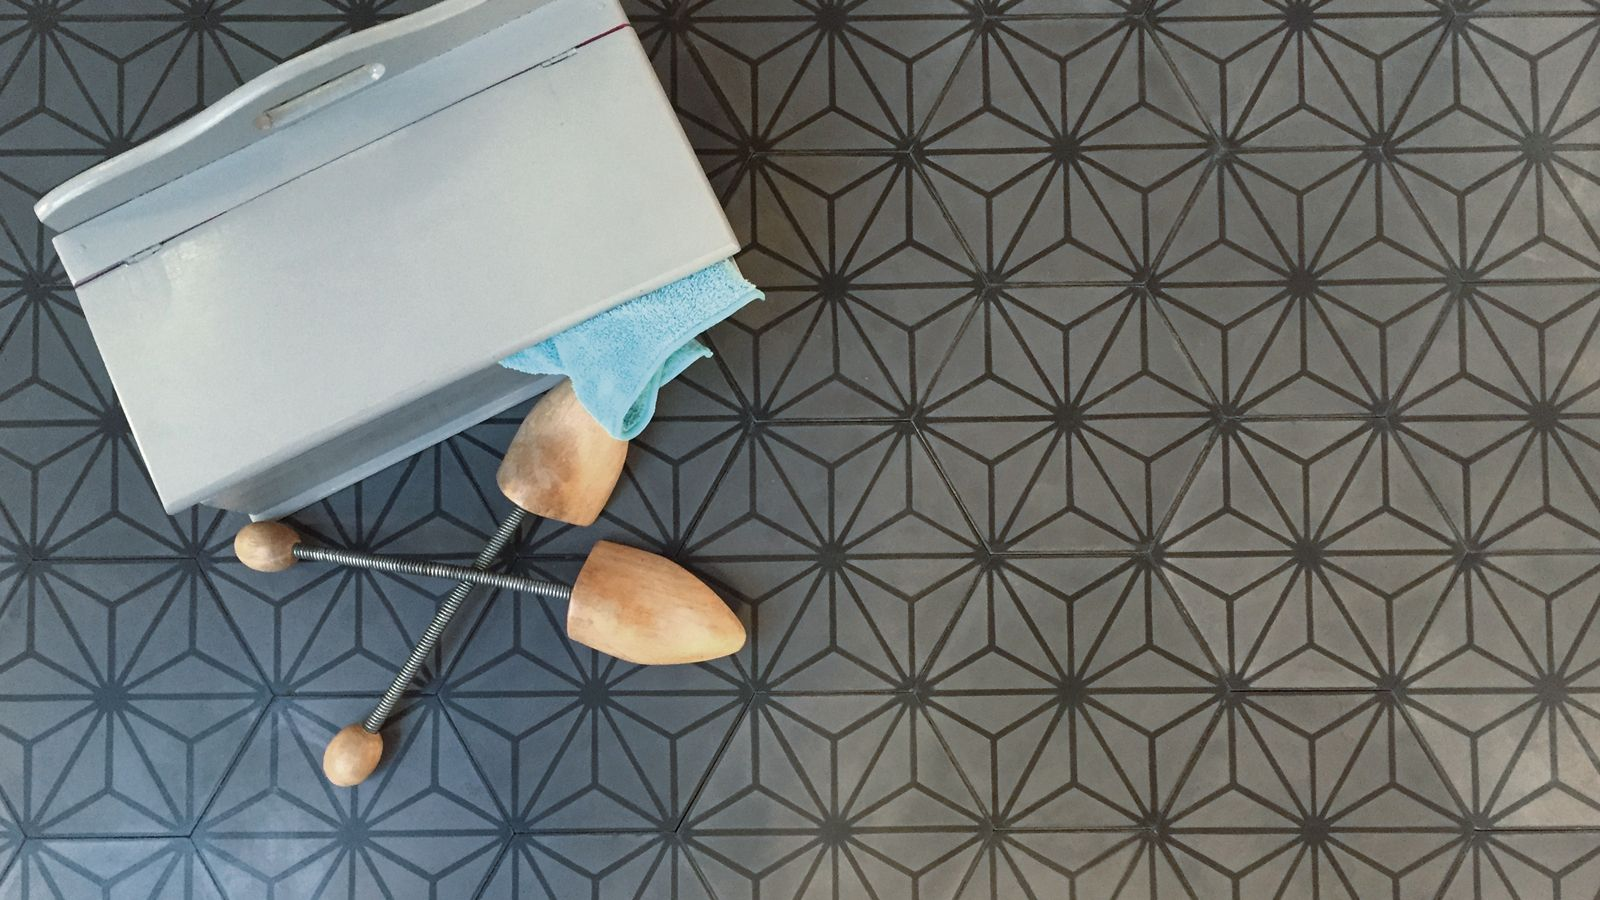 Via Zementfliesen via mosaikfliesen zementfliesen kreidefarbe terrazzoplatten bild